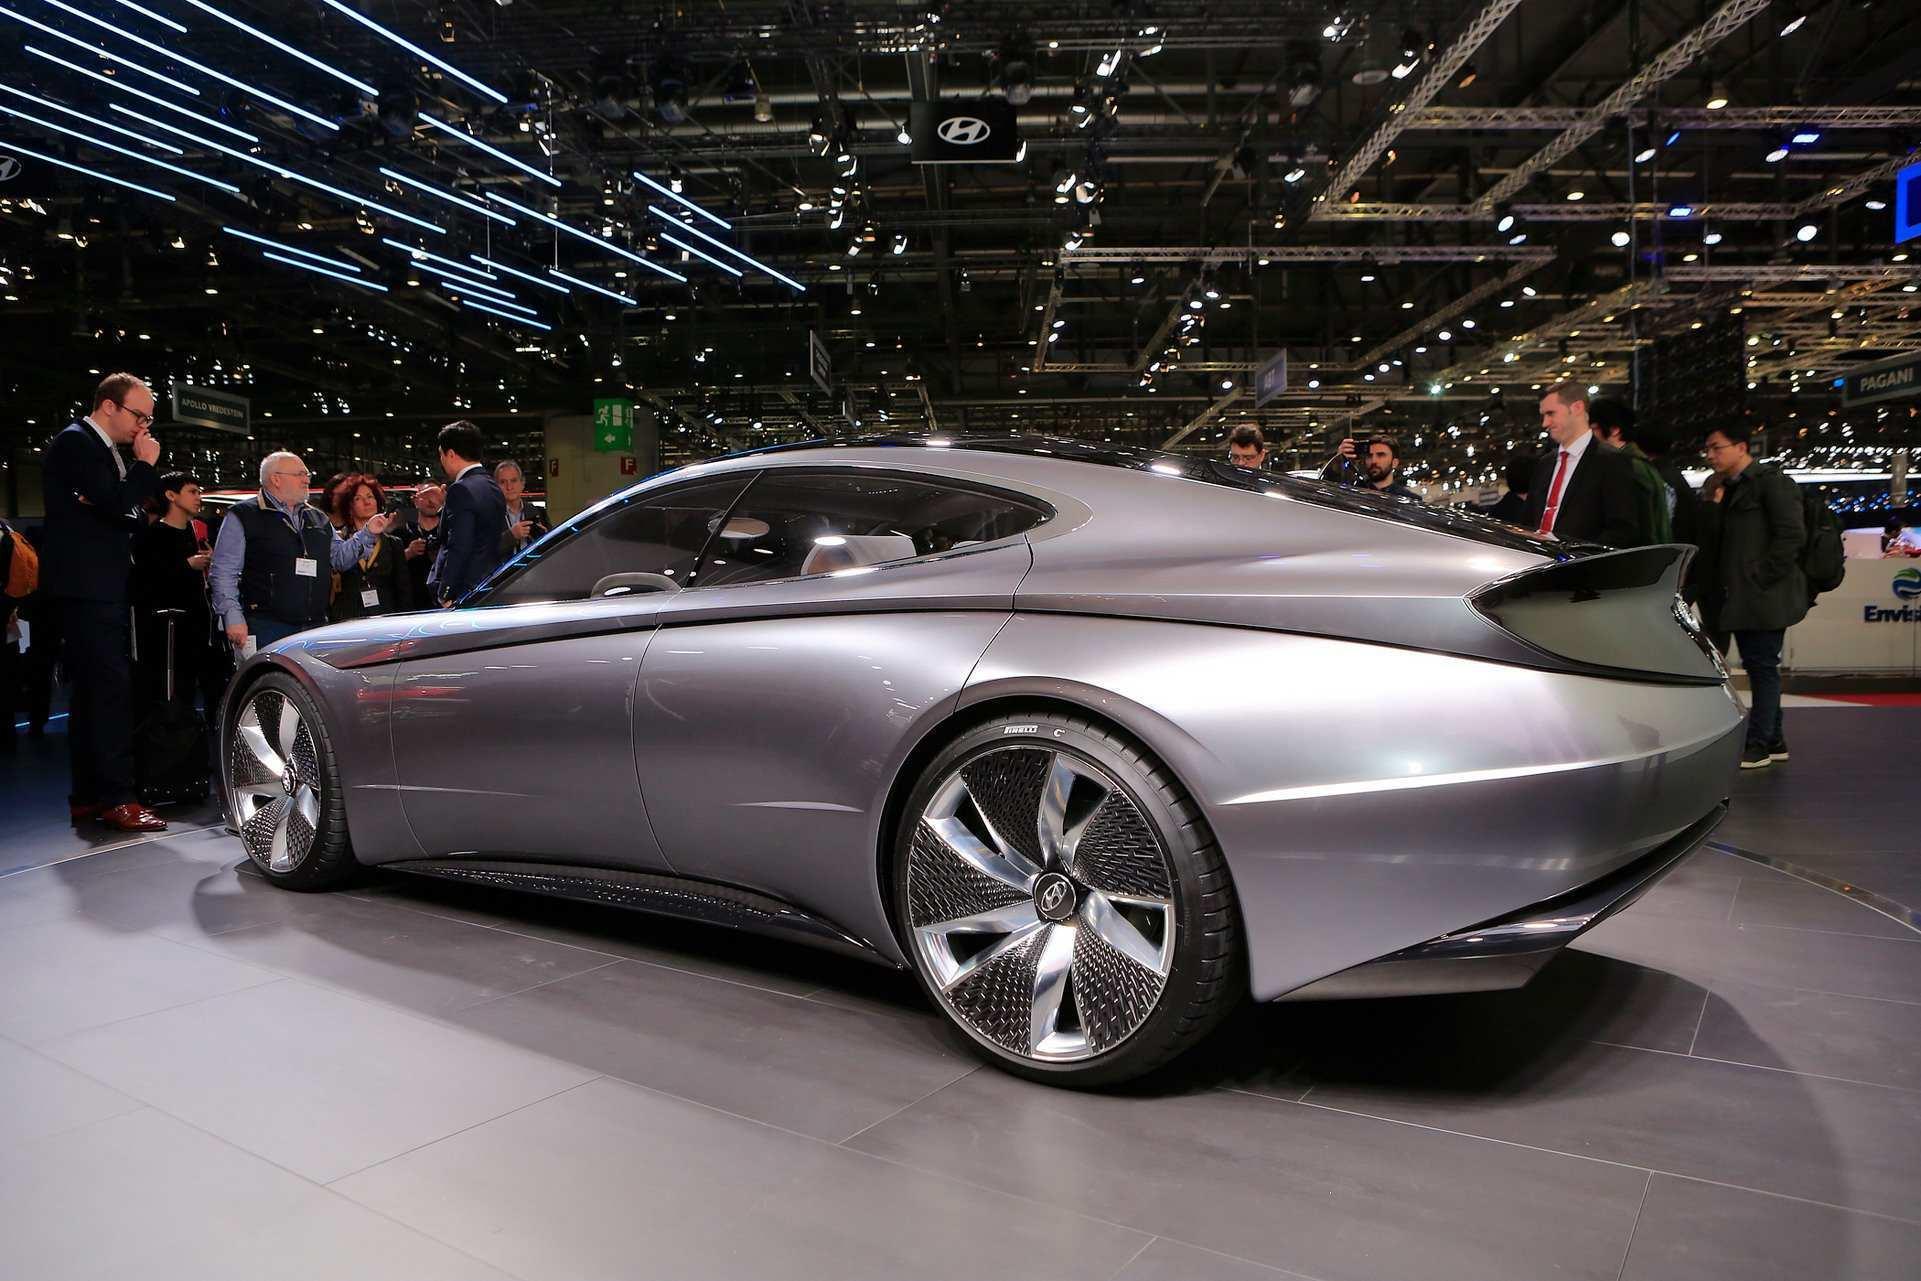 59 Concept of 2020 Hyundai Vehicles Exterior and Interior by 2020 Hyundai Vehicles